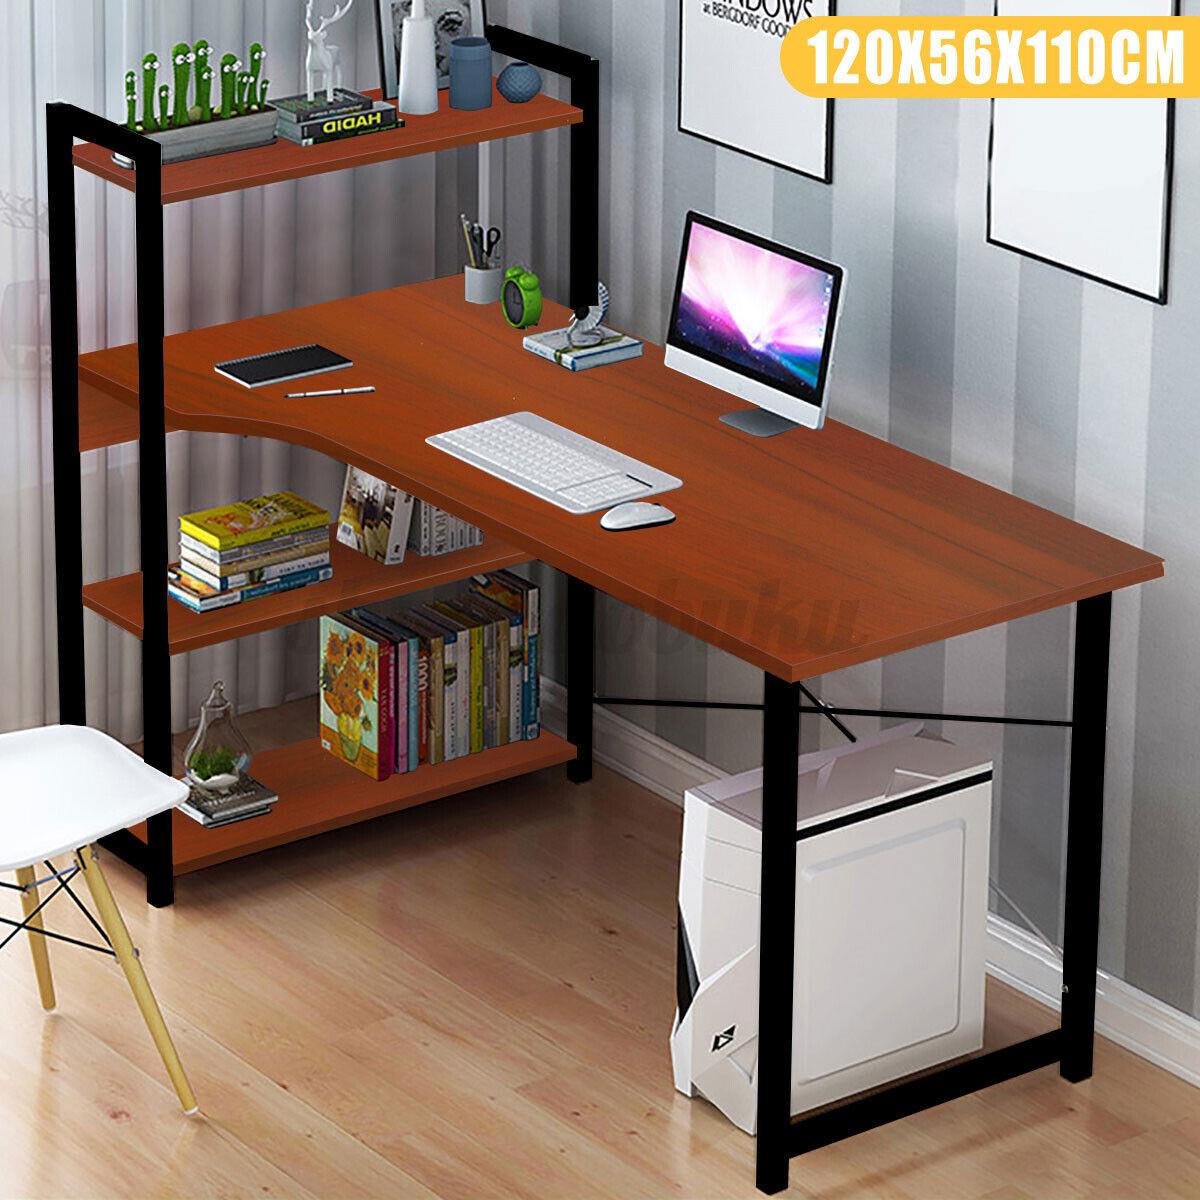 Computer Games - Computer Desk PC Laptop Corner Gaming Table Study Workstation Home Office Shelf